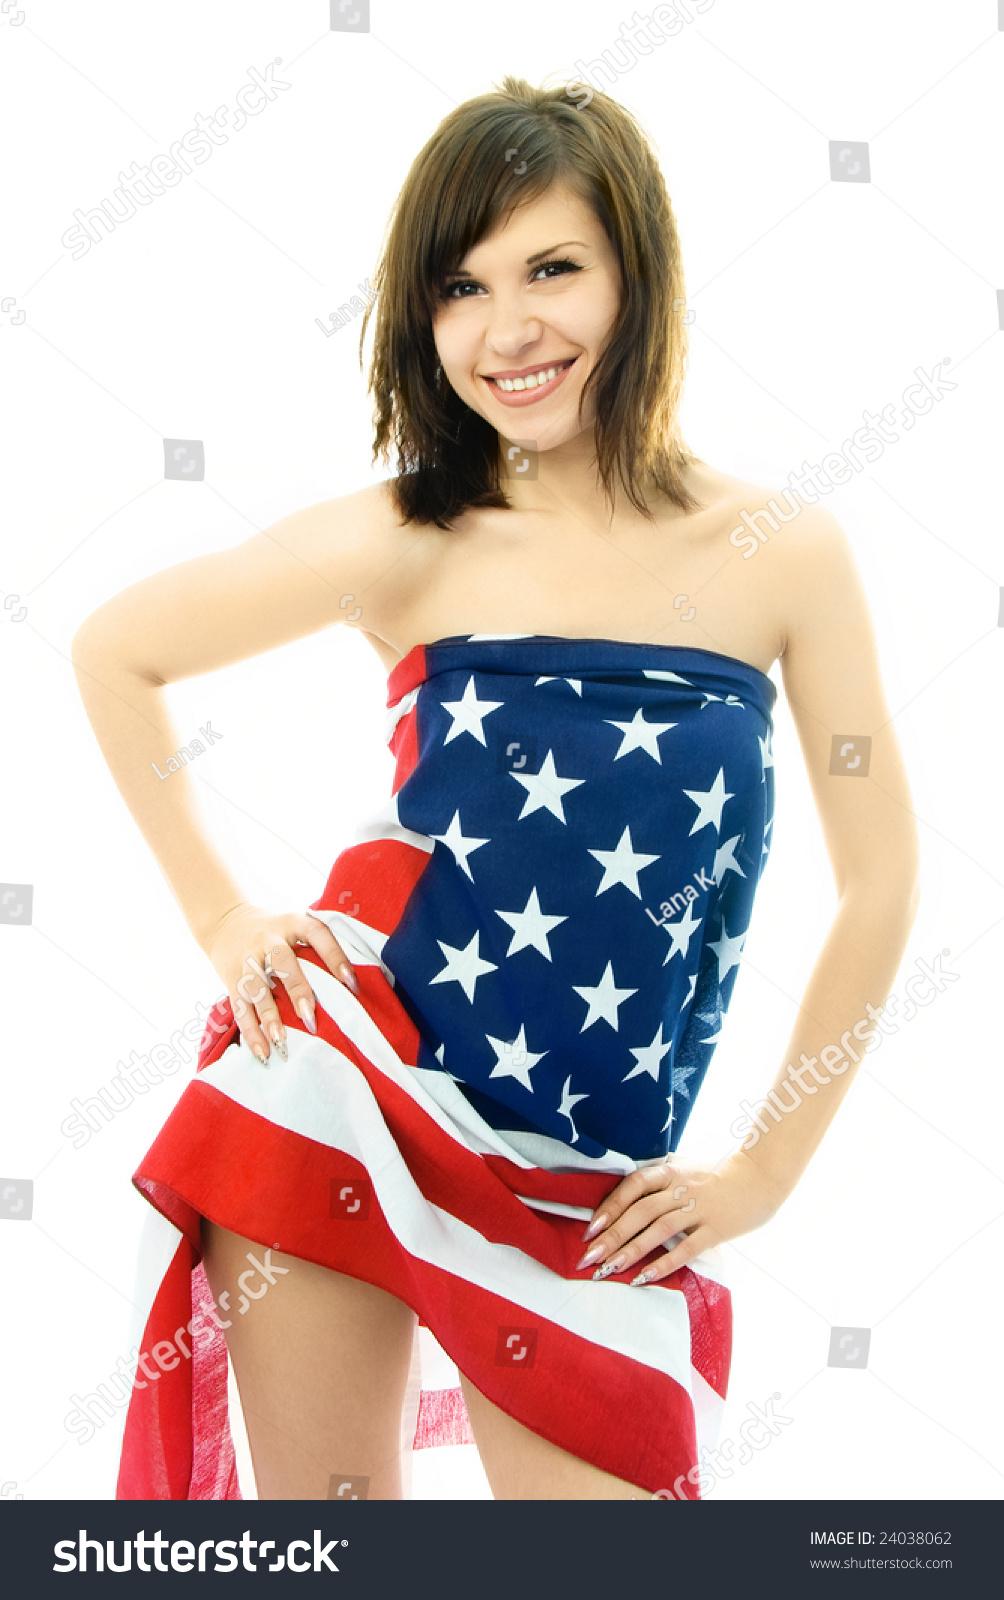 flag woman American naked